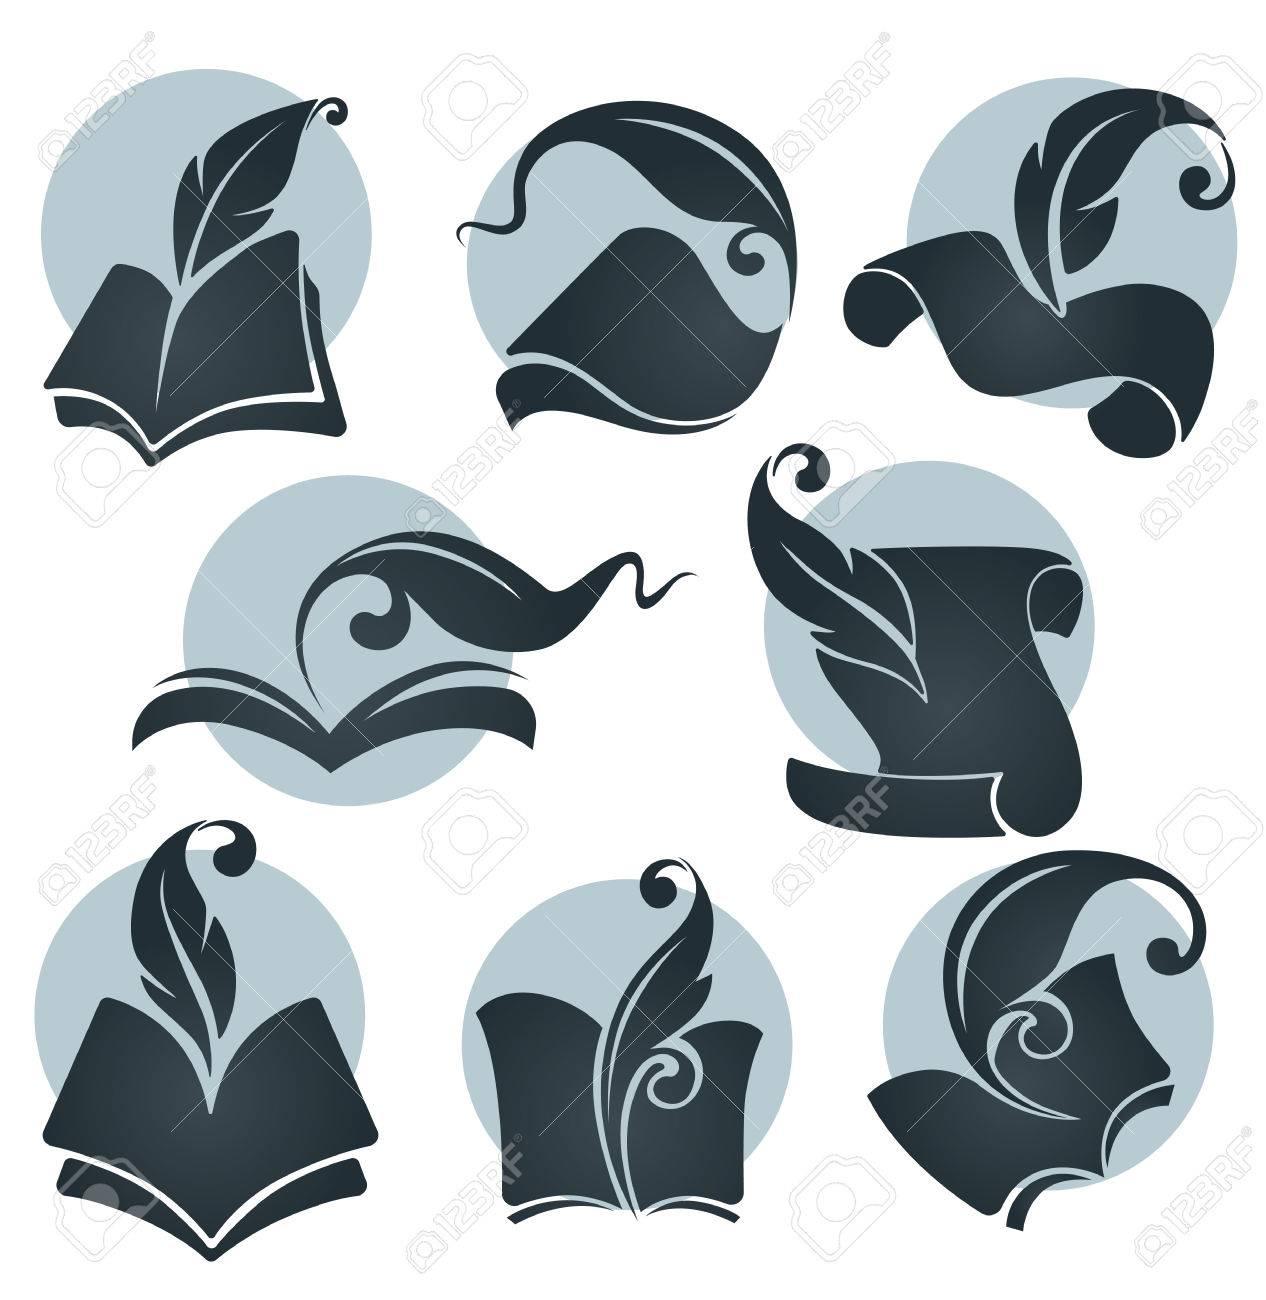 Writing in symbols